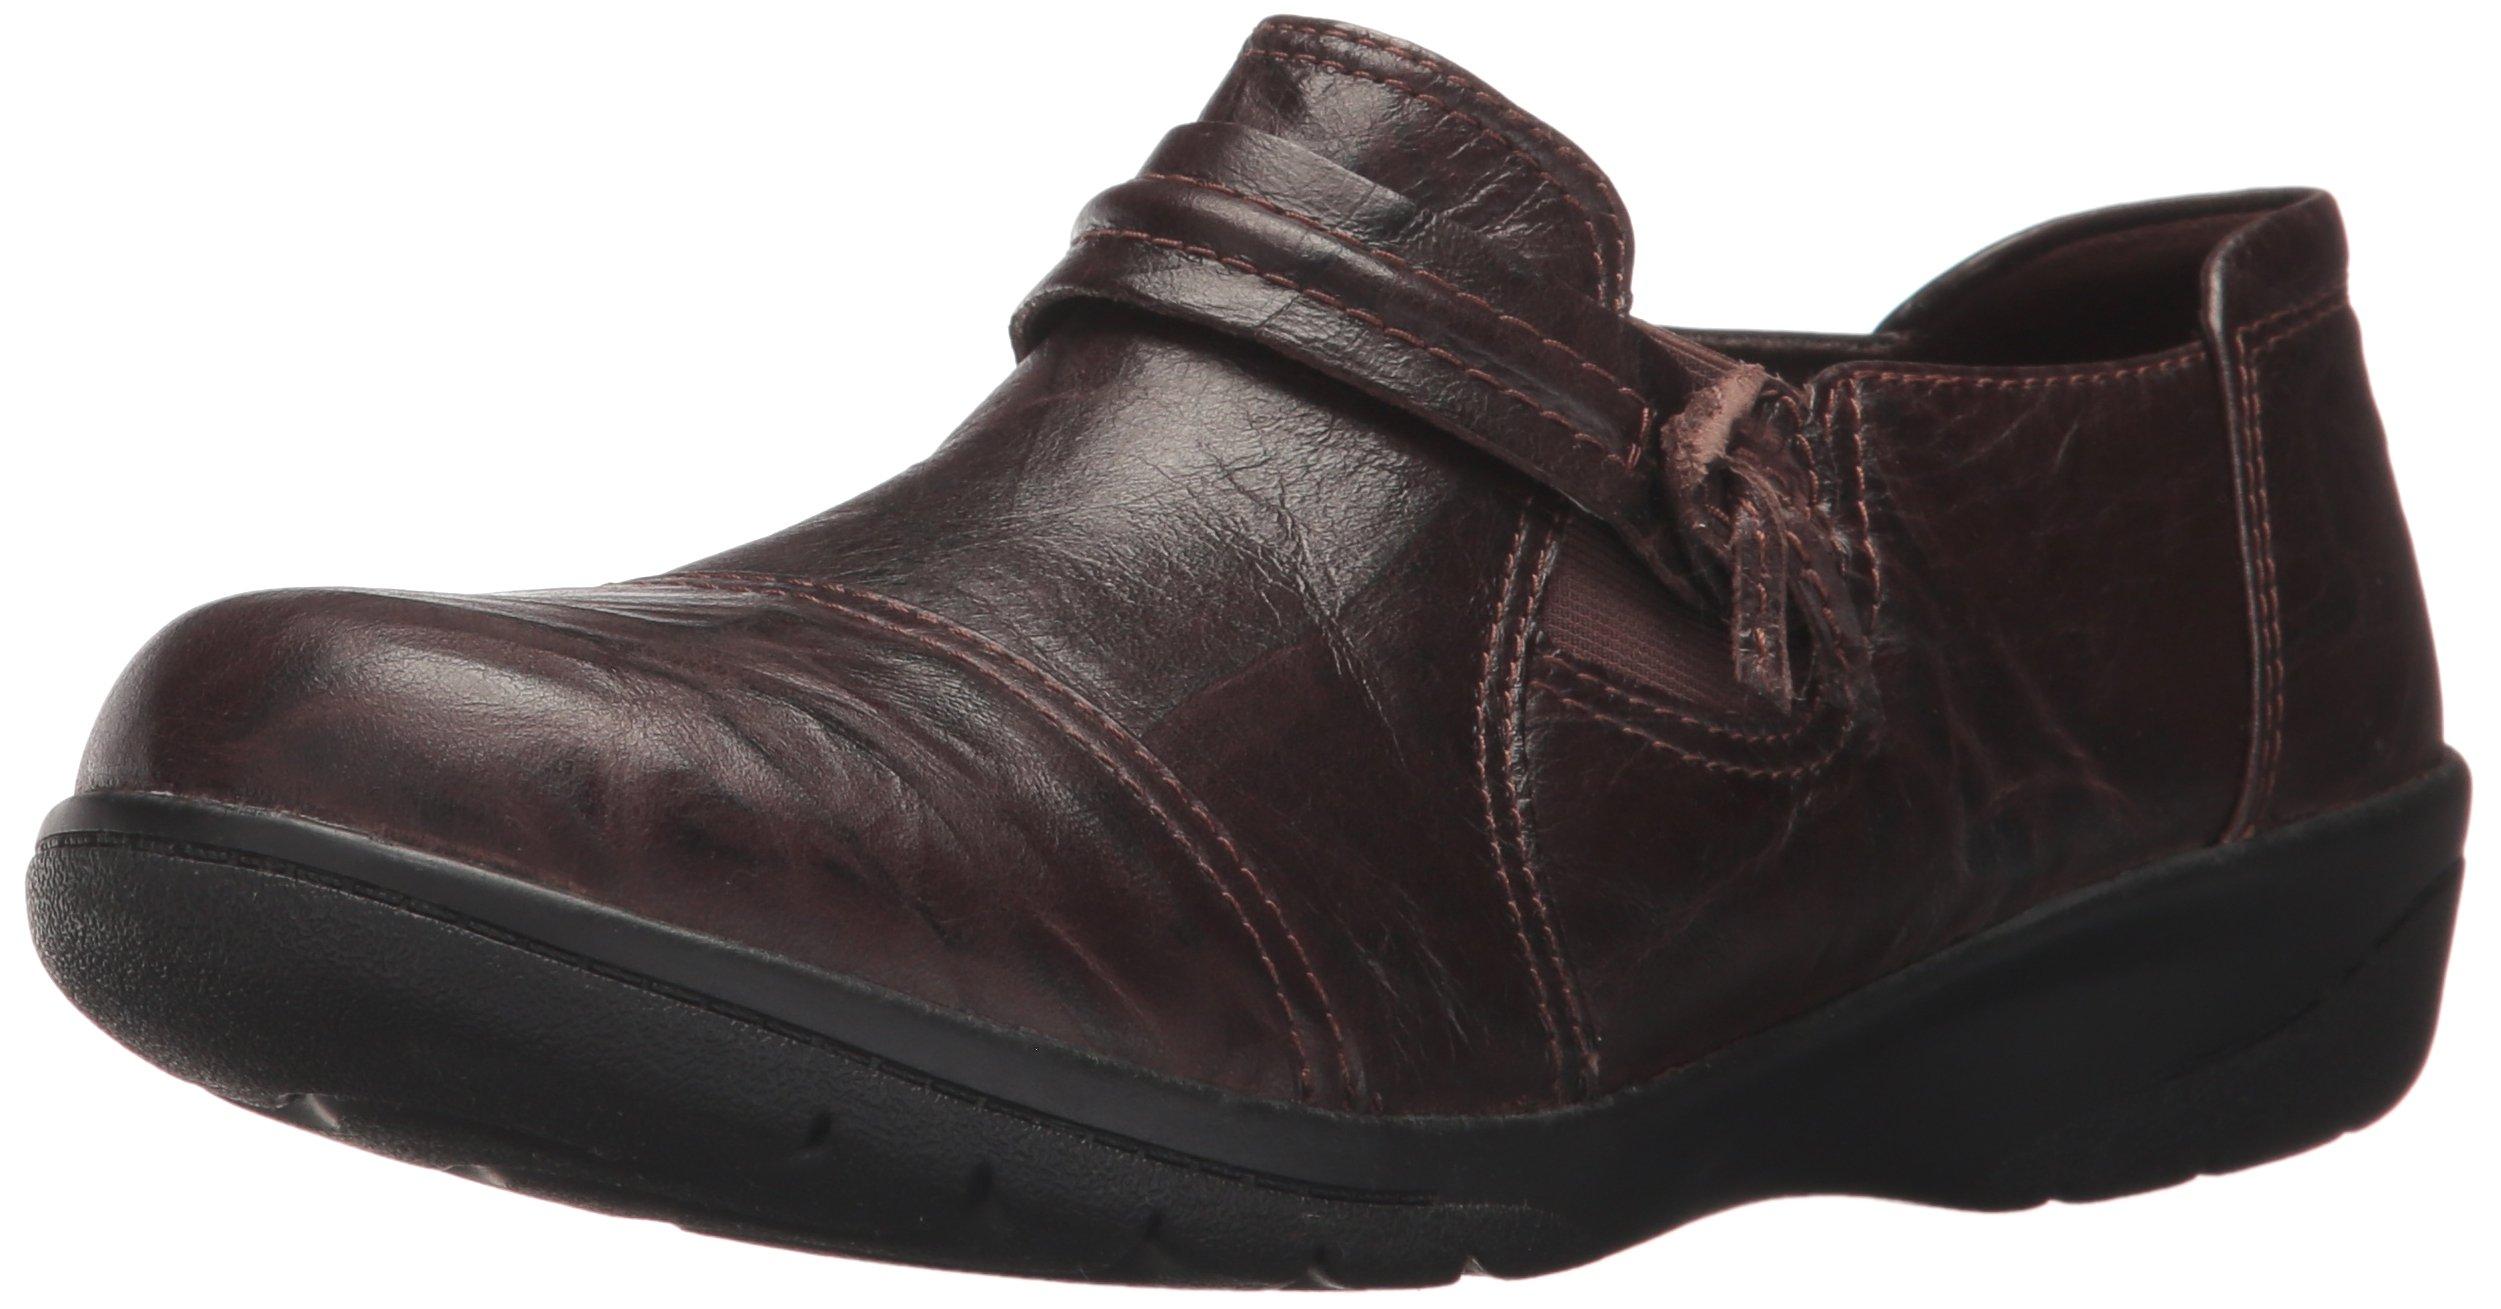 CLARKS Women's Cheyn Madi Slip-On Loafer, Dark Brown Scrunch Leather, 8 M US